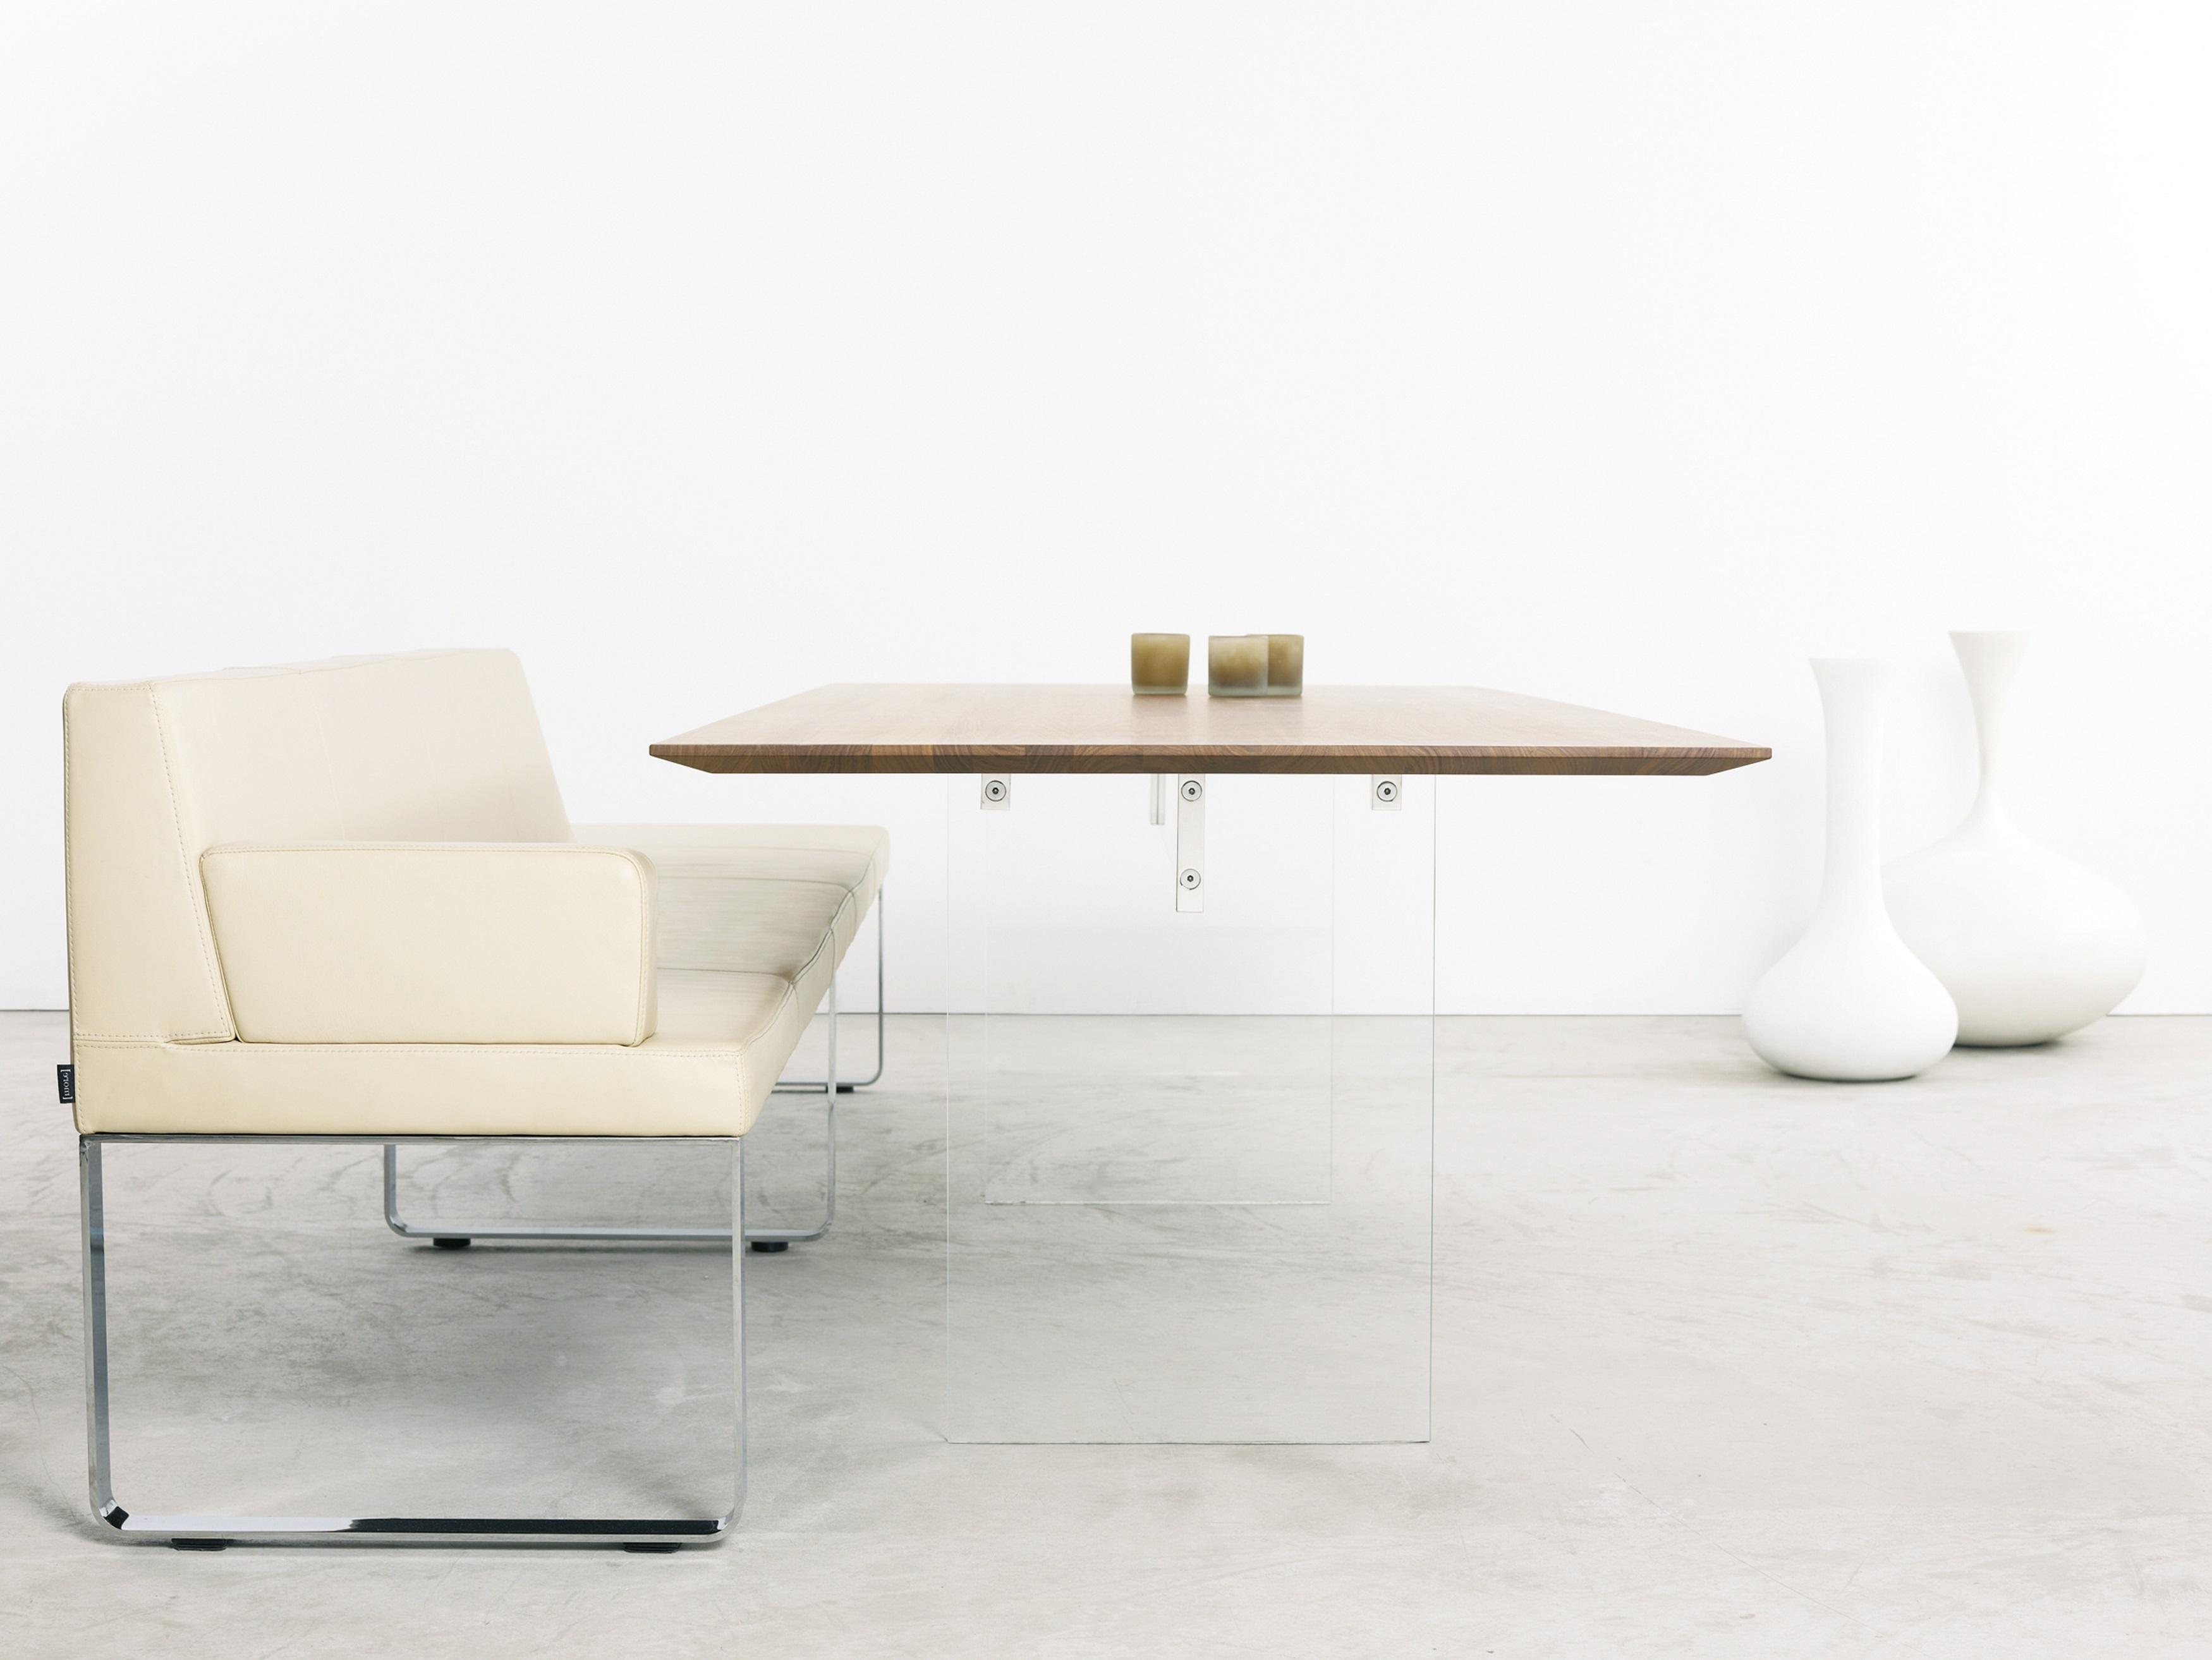 mbel kln perfect hausmann mobel koln gros schones zuhause. Black Bedroom Furniture Sets. Home Design Ideas